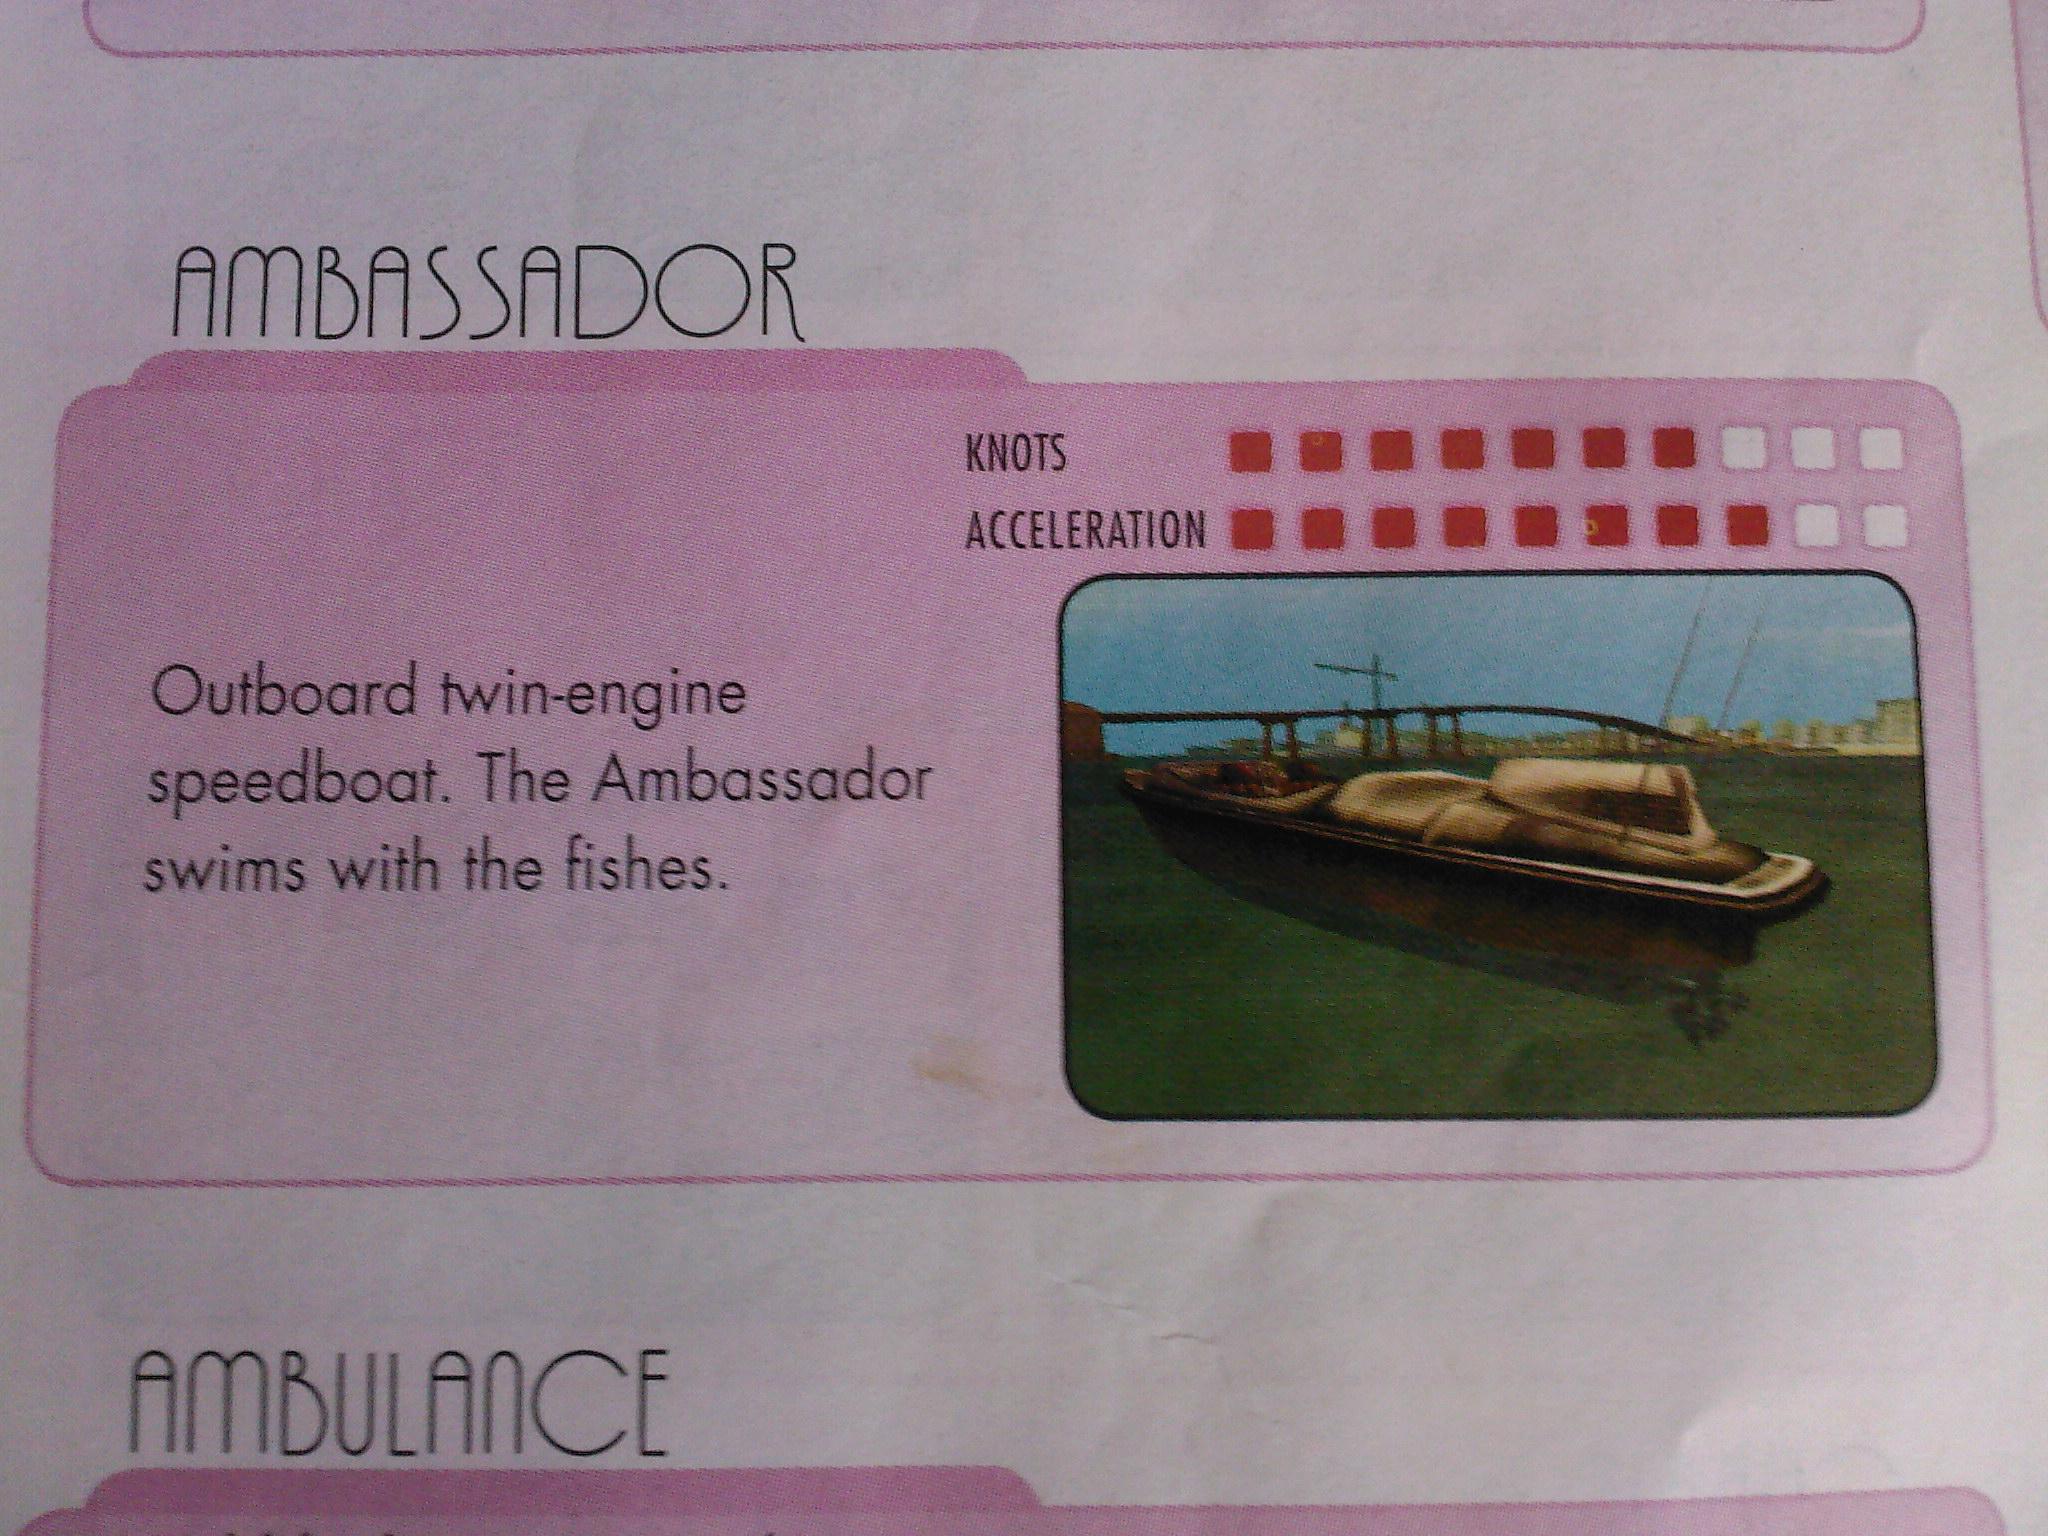 Ambassador_in_bradygames_guide.jpg